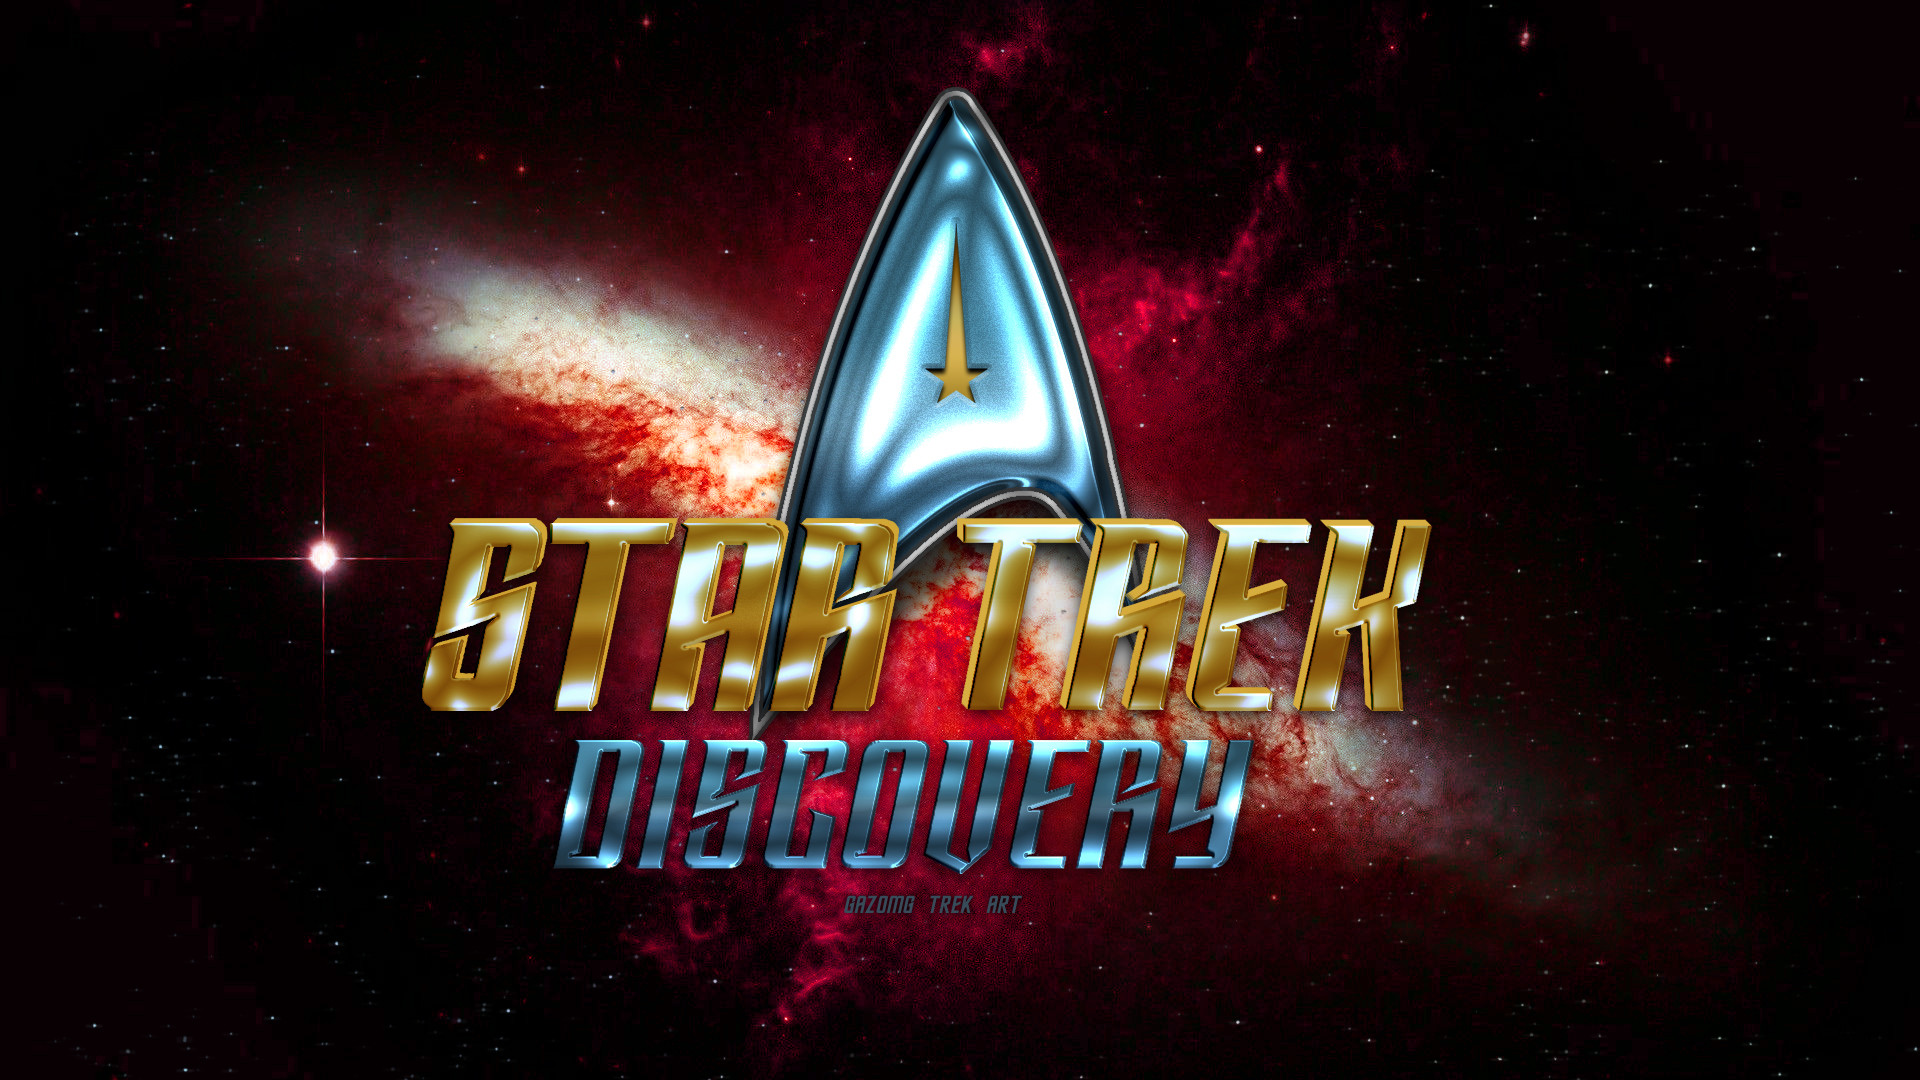 Star Trek Discovery 2017 Wallpaper (updated) by gazomg on DeviantArt